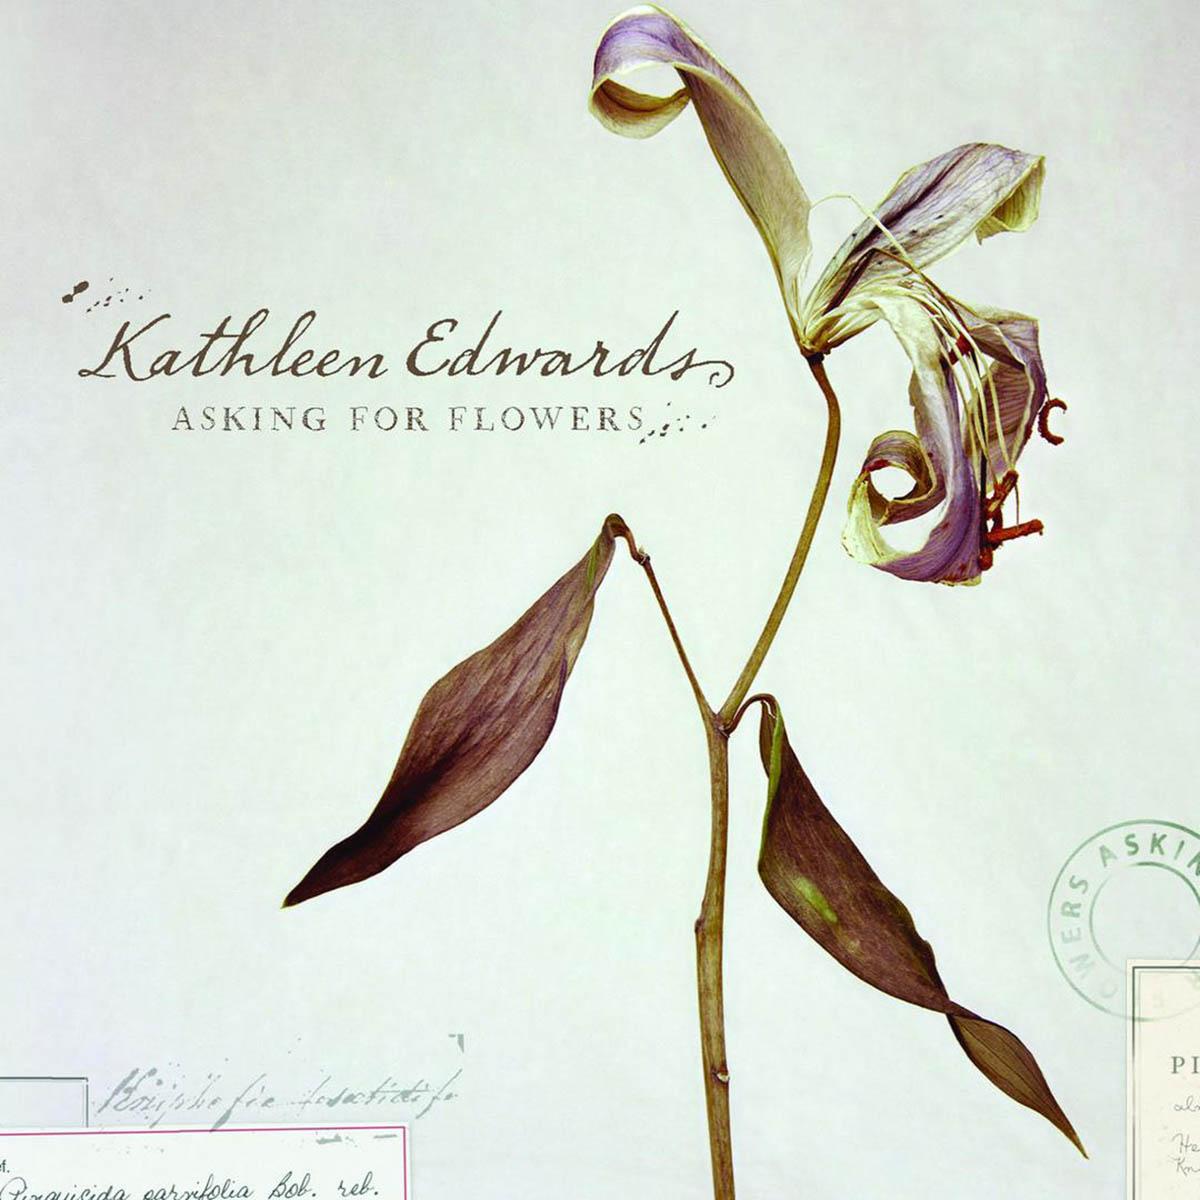 Kathleen Edwards, Asking for Flowers